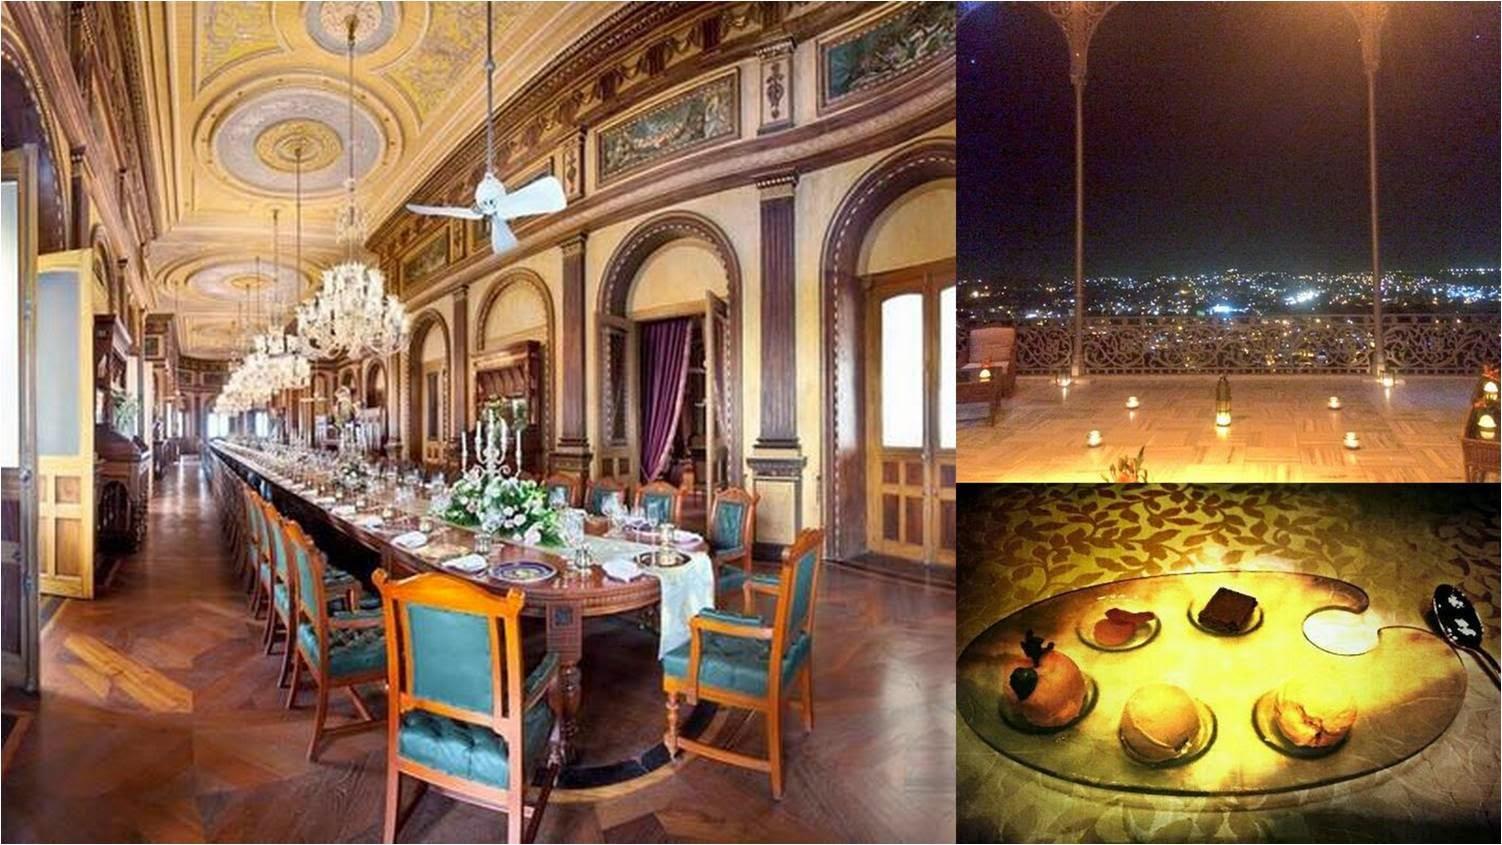 Dinning hall of Taj Falaknuma Palace